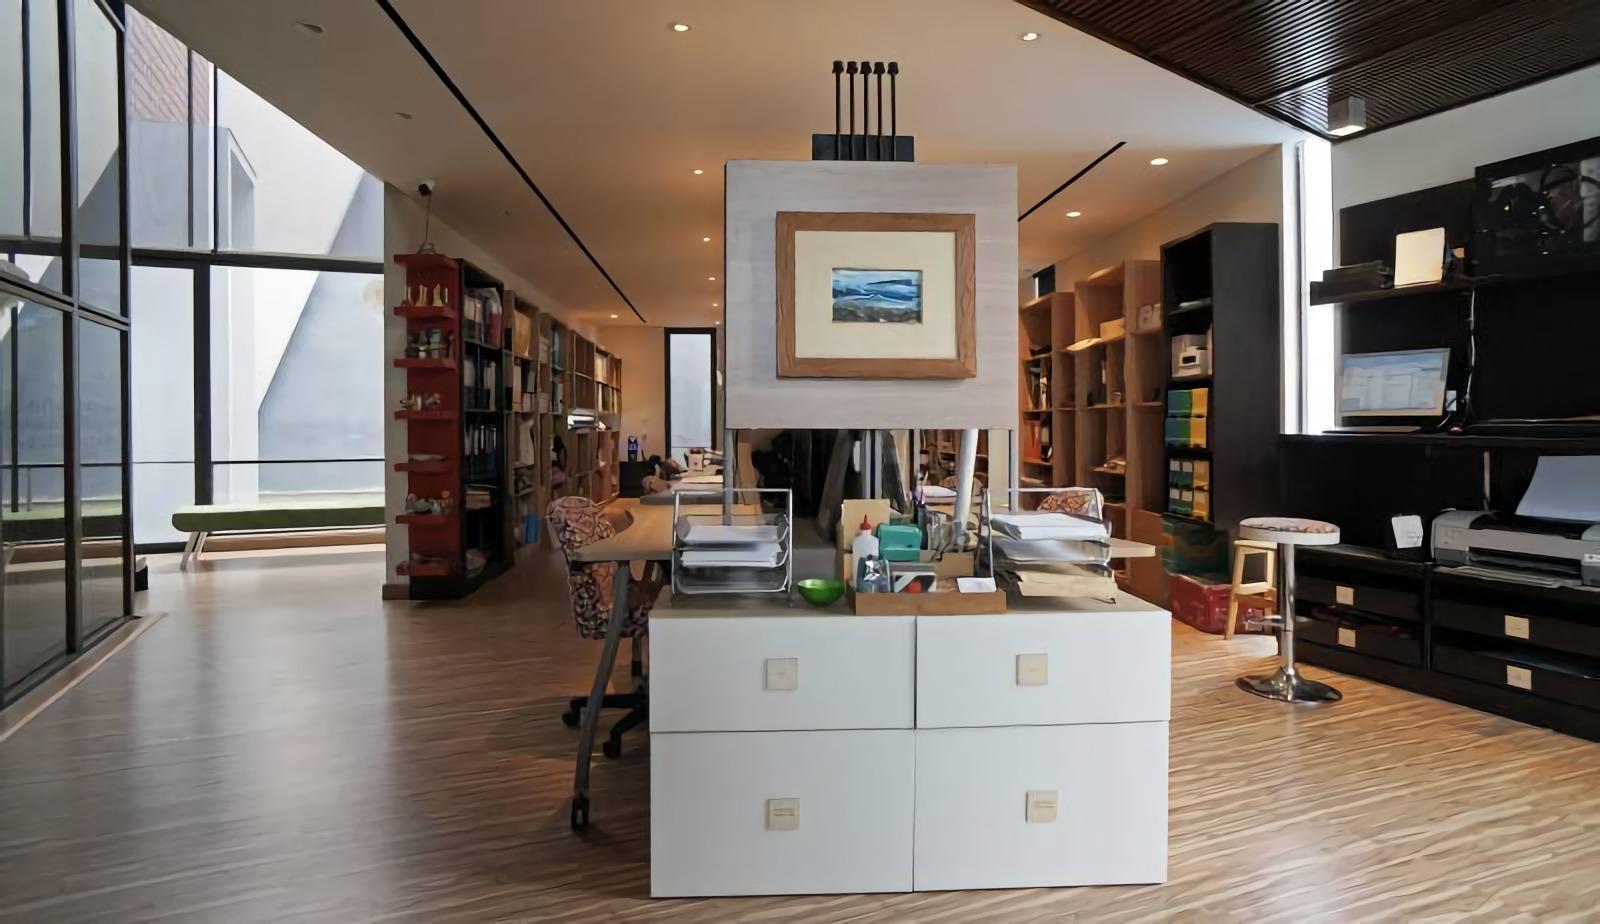 Ingin Tahu Suasana Kantor Arsitek? Yuk, Intip Sonny Sutanto Architect New Office yang Unik Ini | Foto artikel Arsitag